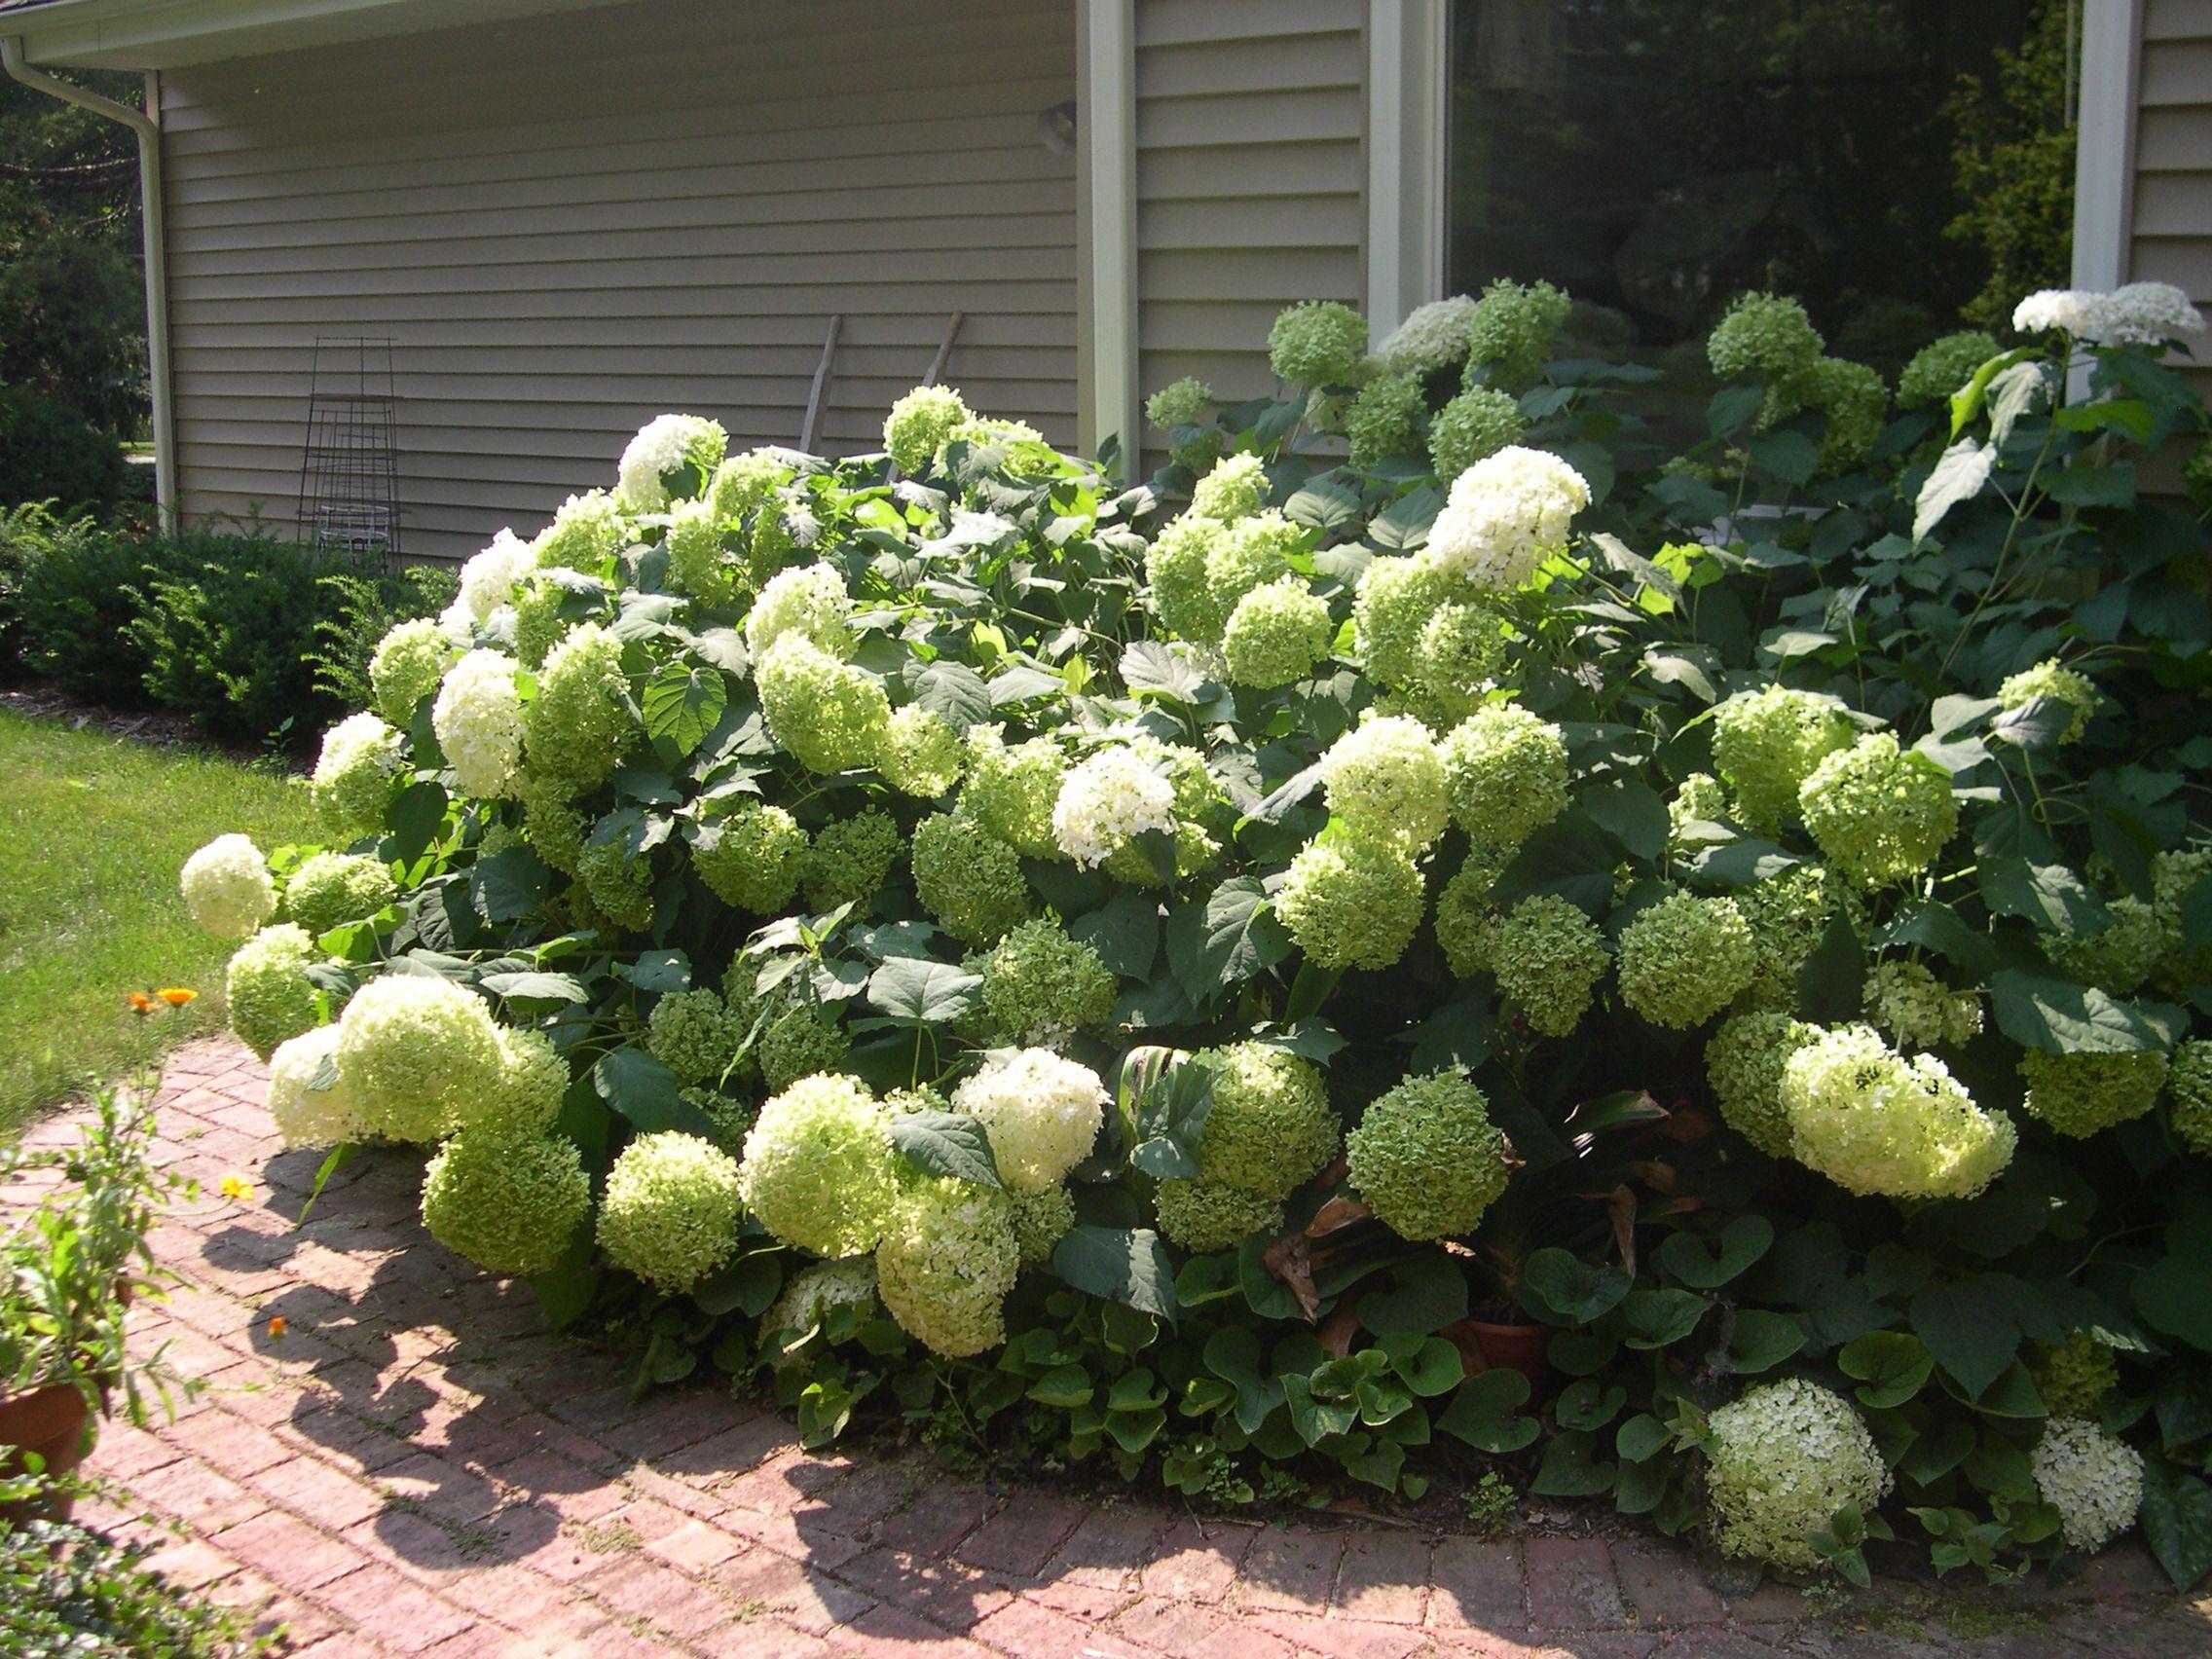 green hydrangea bushes - Google Search